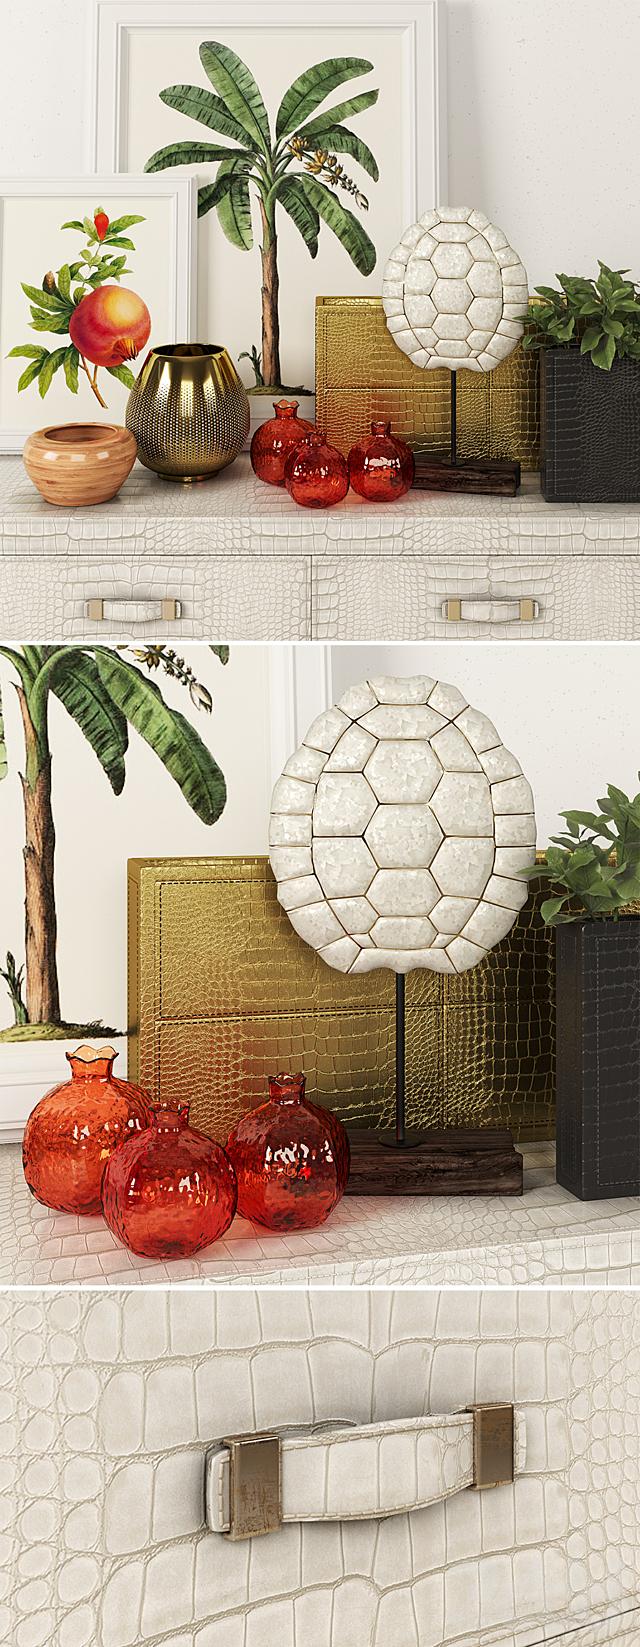 Rugiano Florida + decorative set